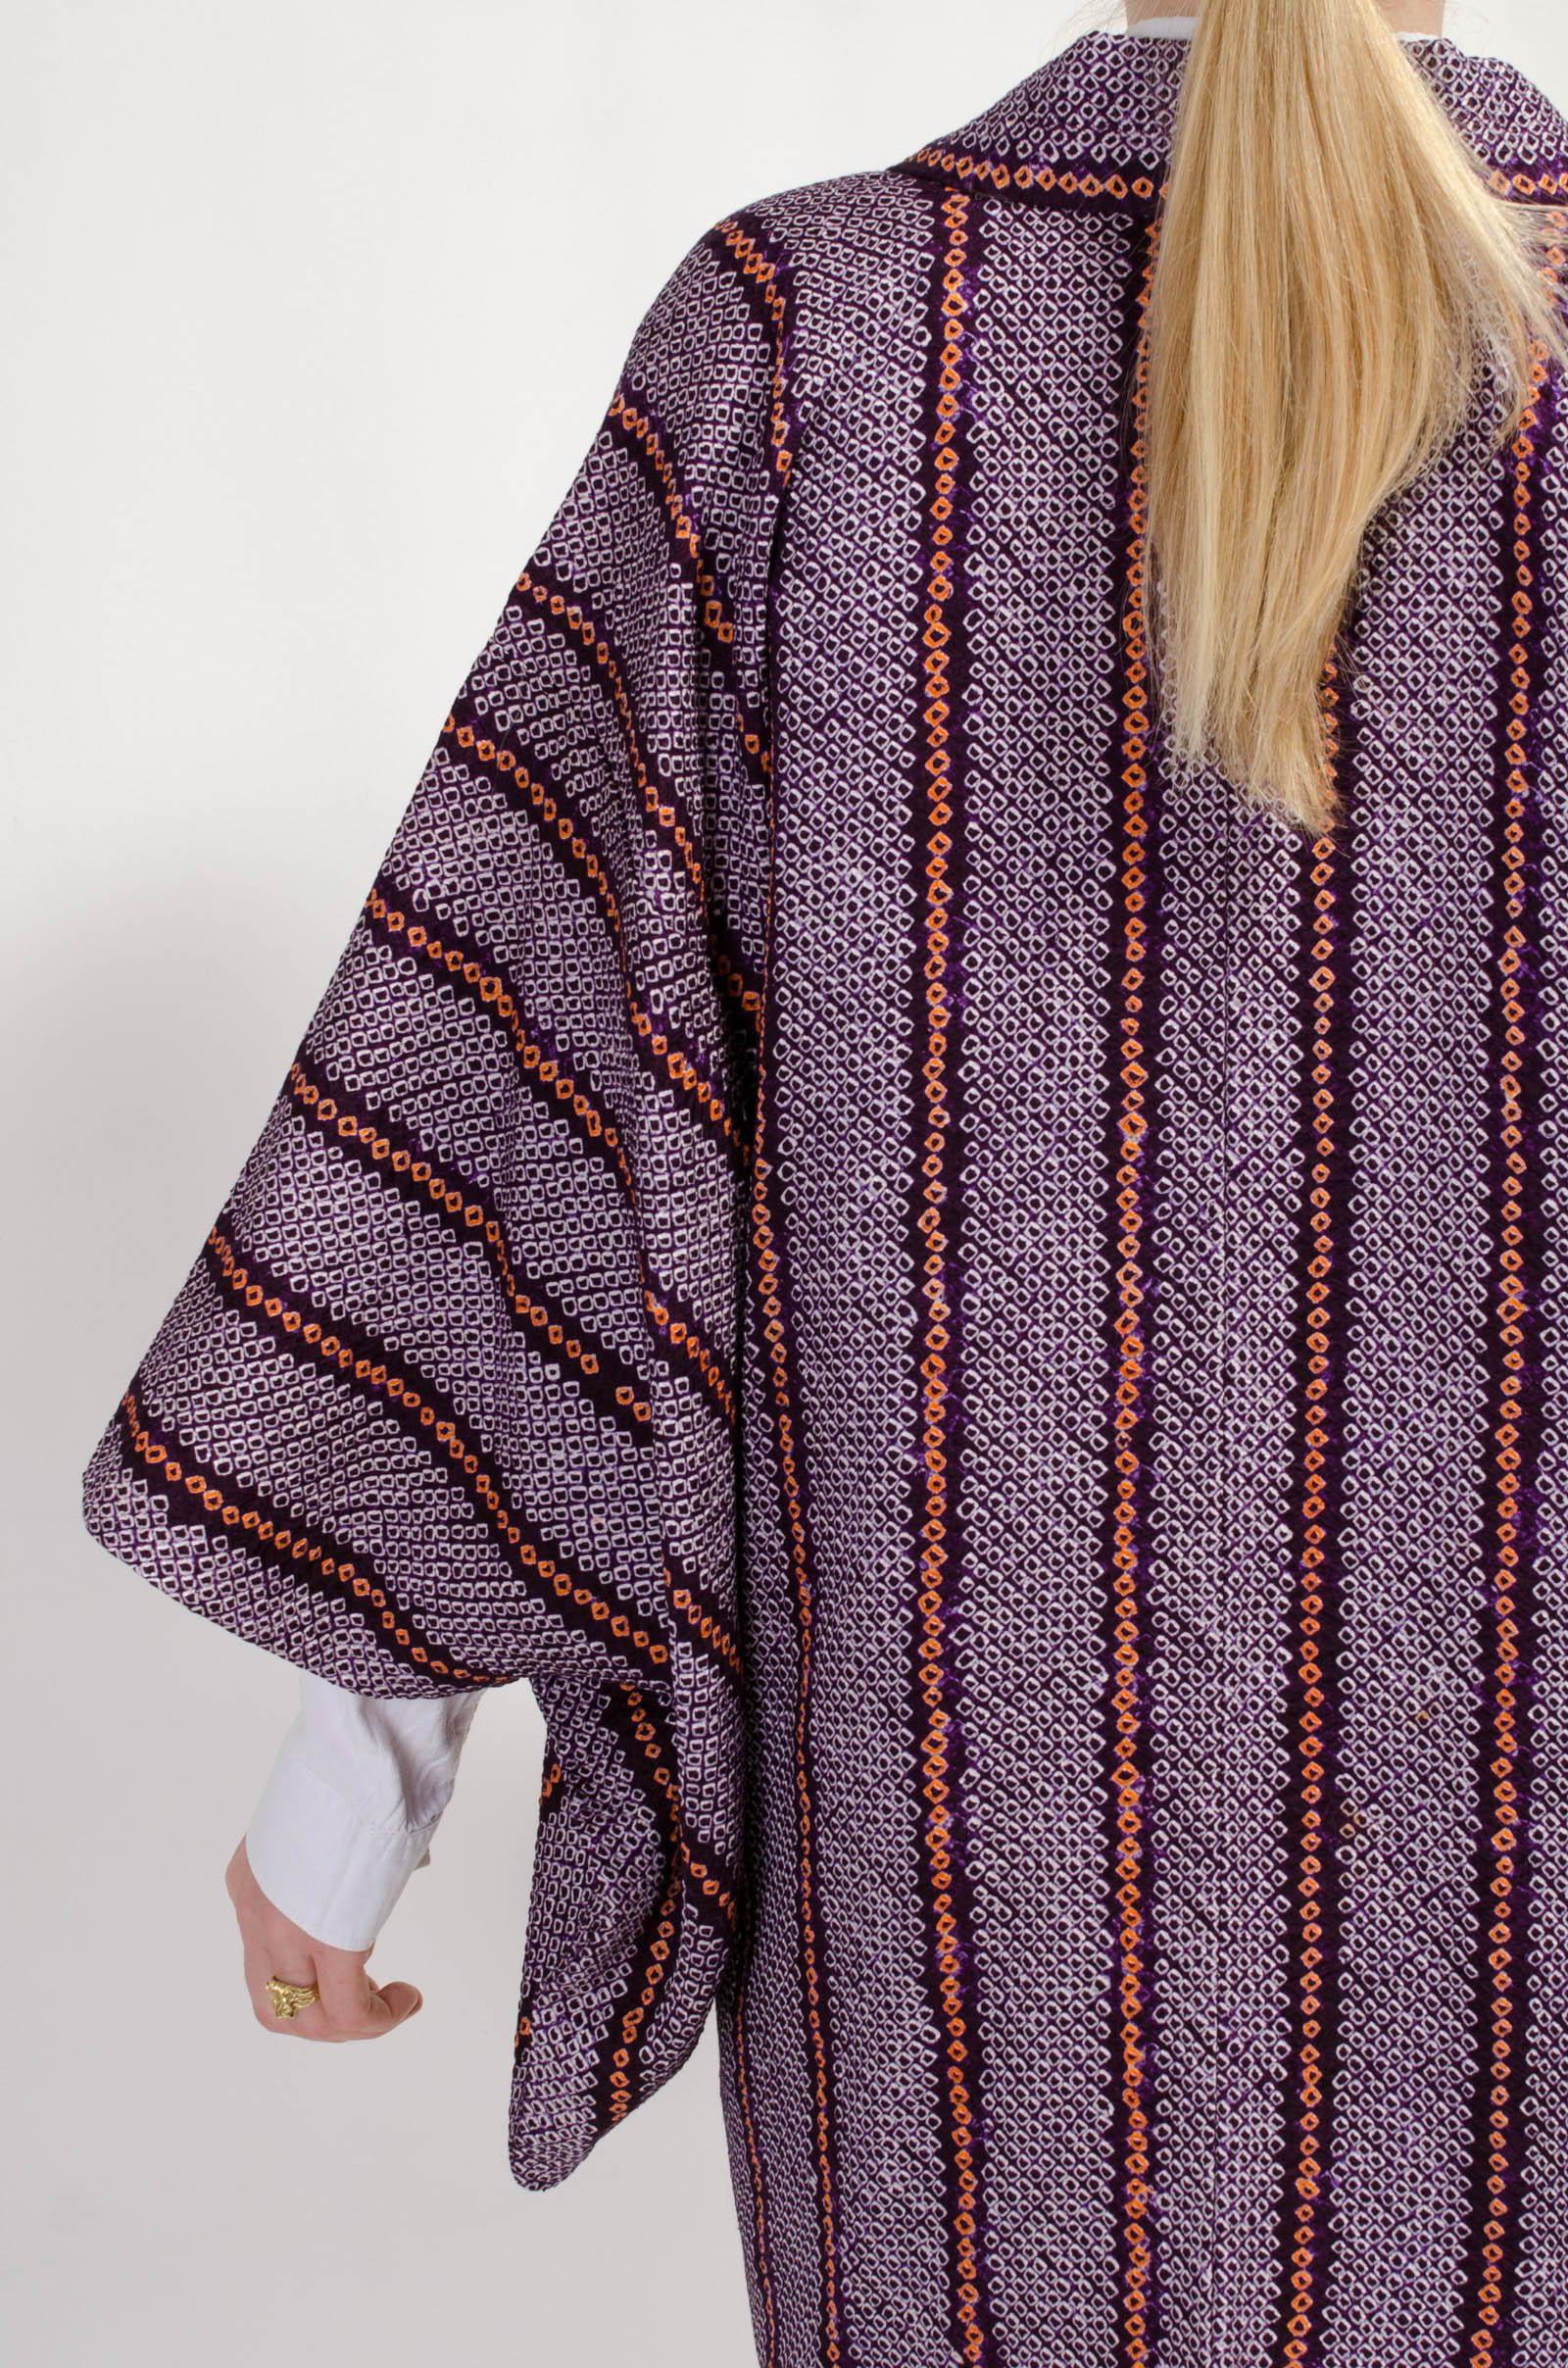 Vintage Kimonos - Haoris - Online at modern Archive Berlin